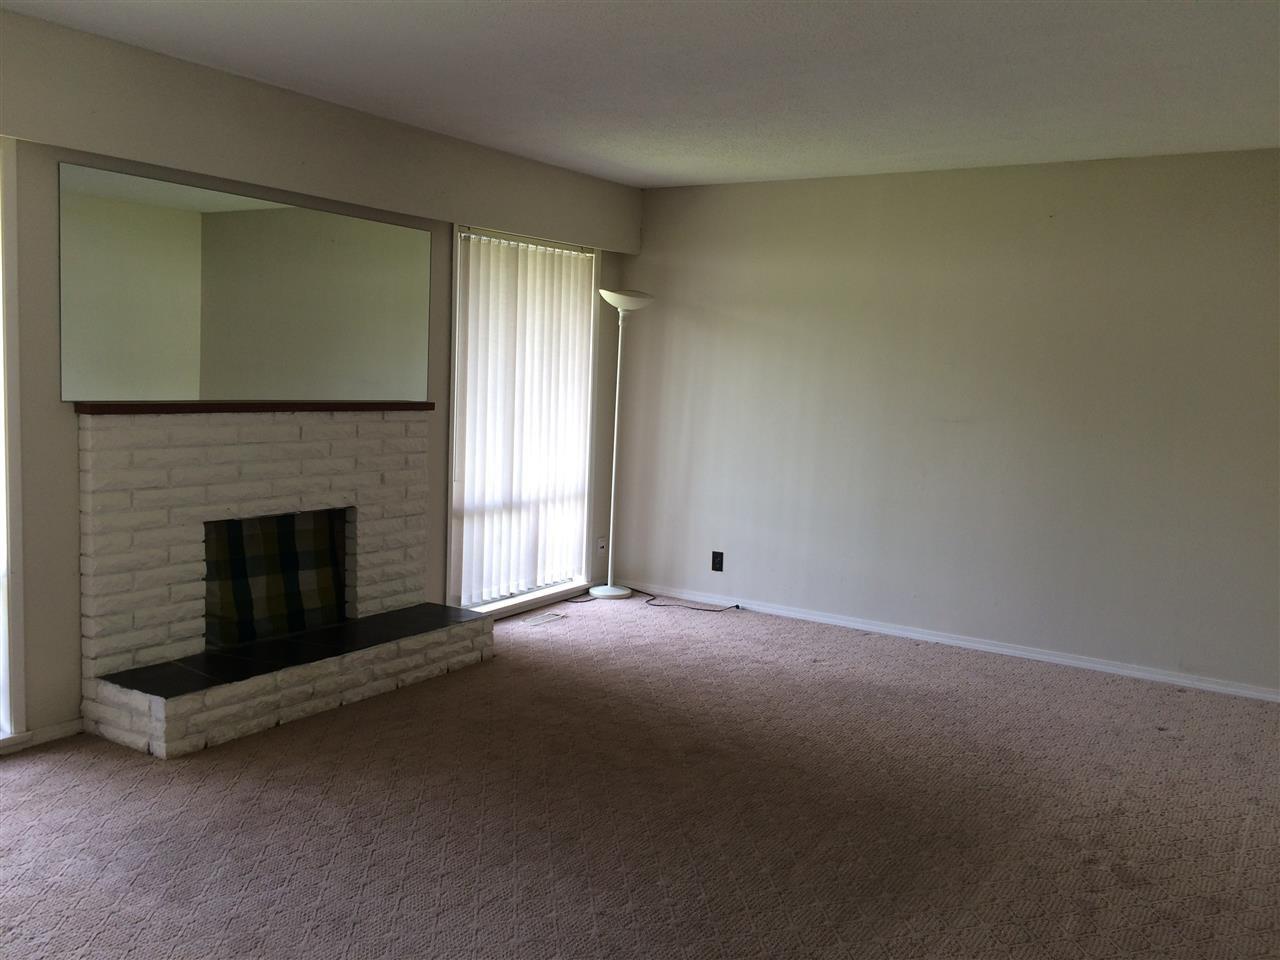 Photo 2: Photos: 12361 BONSON Road in Pitt Meadows: Mid Meadows House for sale : MLS®# R2078094